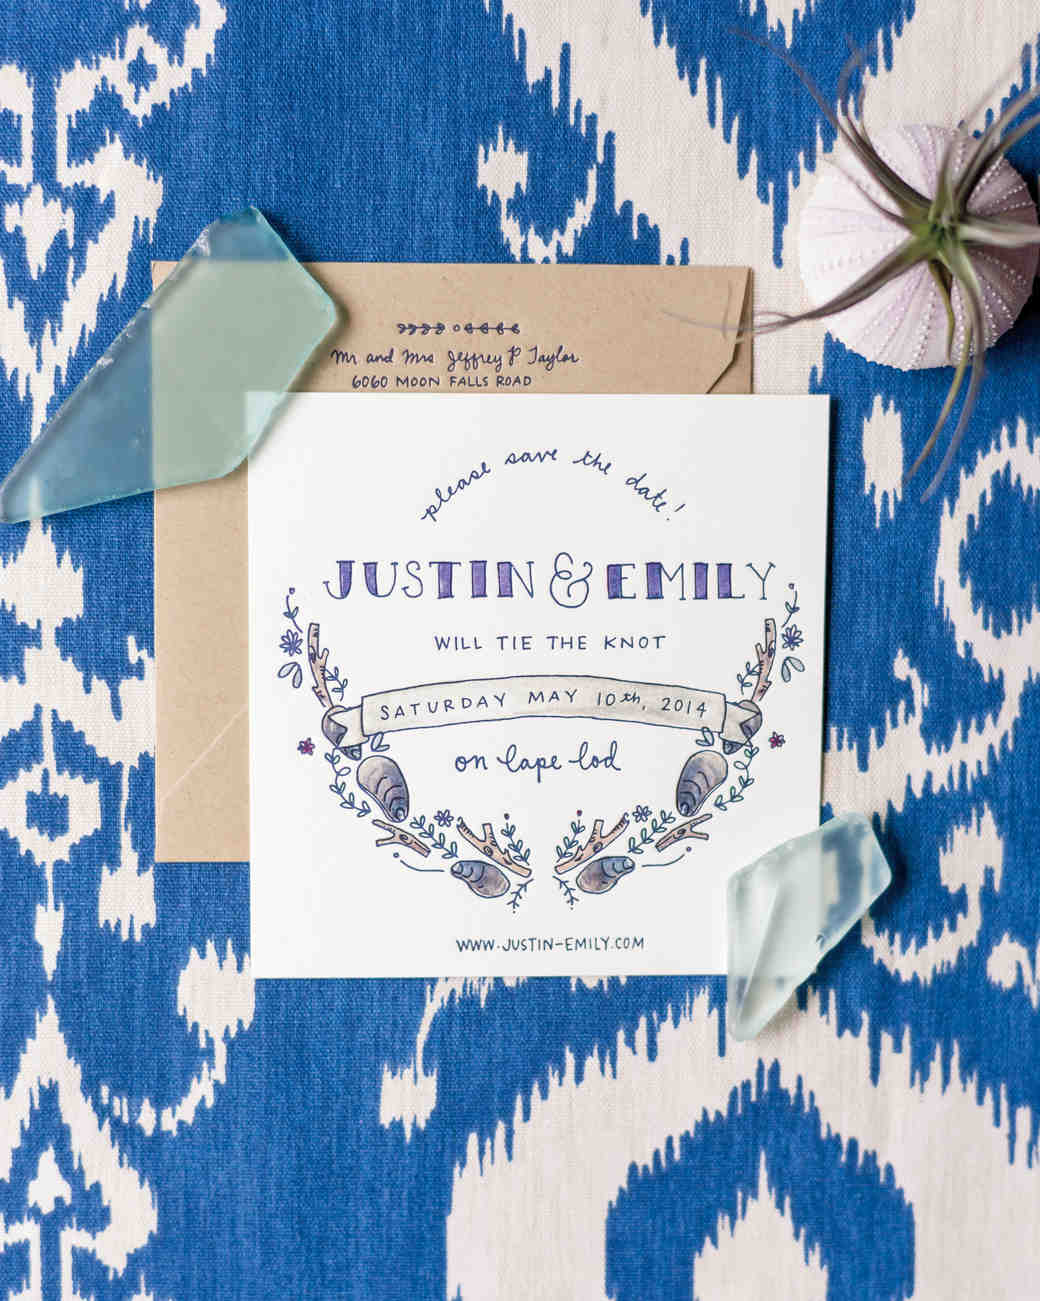 emily-justin-wedding-cape-cod-invite-2-s111843.jpg